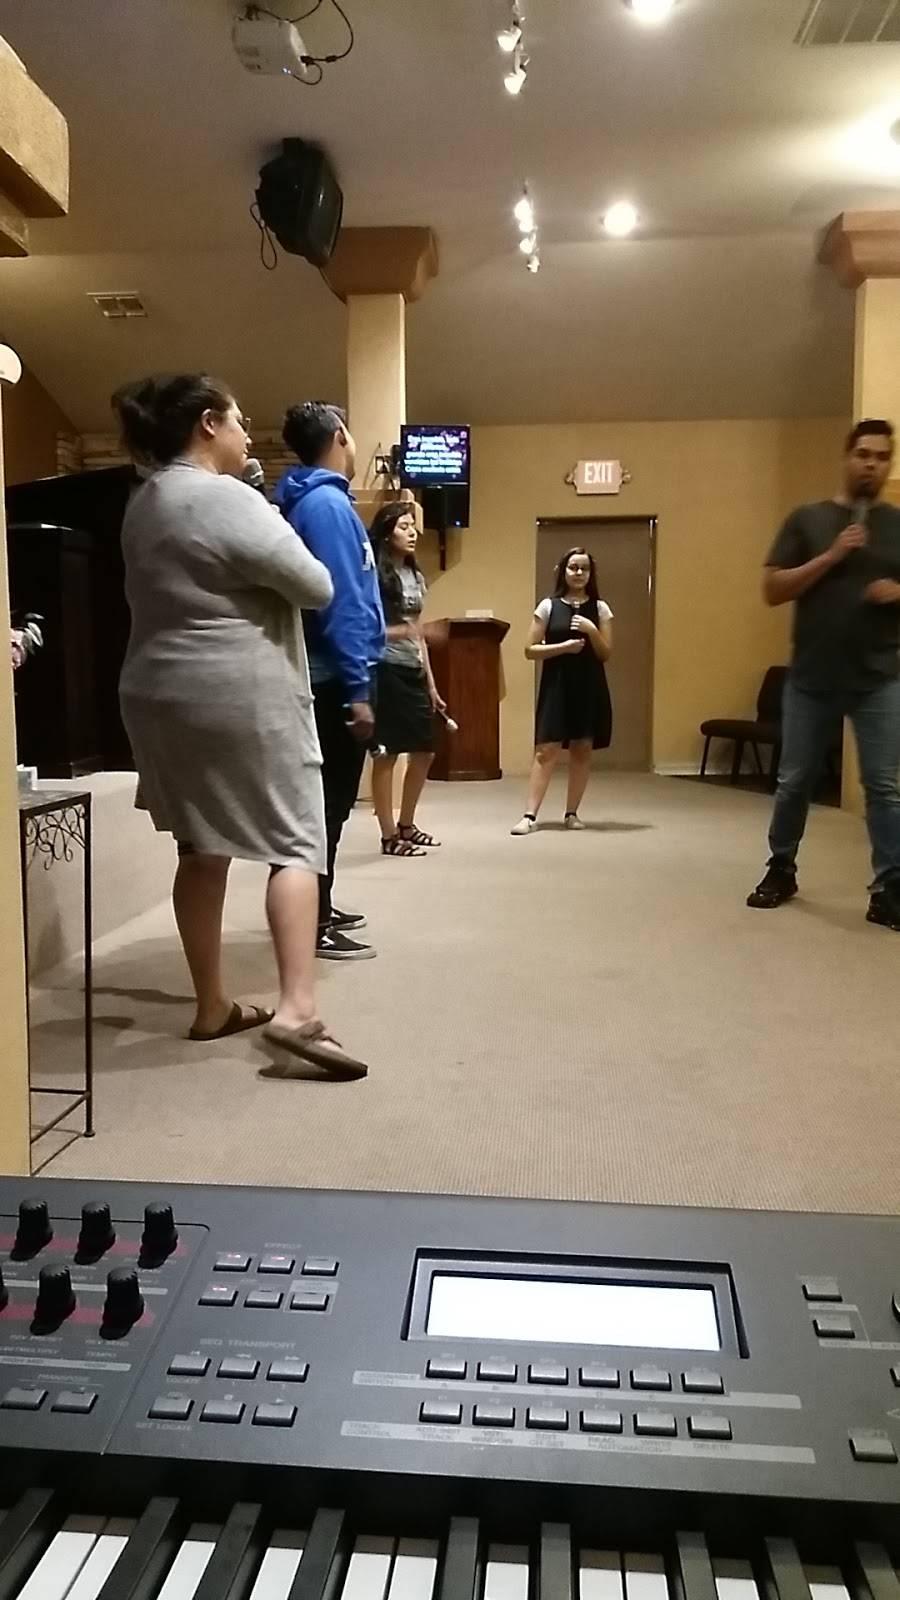 Life and Salvation Avondale Apostolic Assembly - church  | Photo 2 of 4 | Address: 707 E Hill Dr, Avondale, AZ 85323, USA